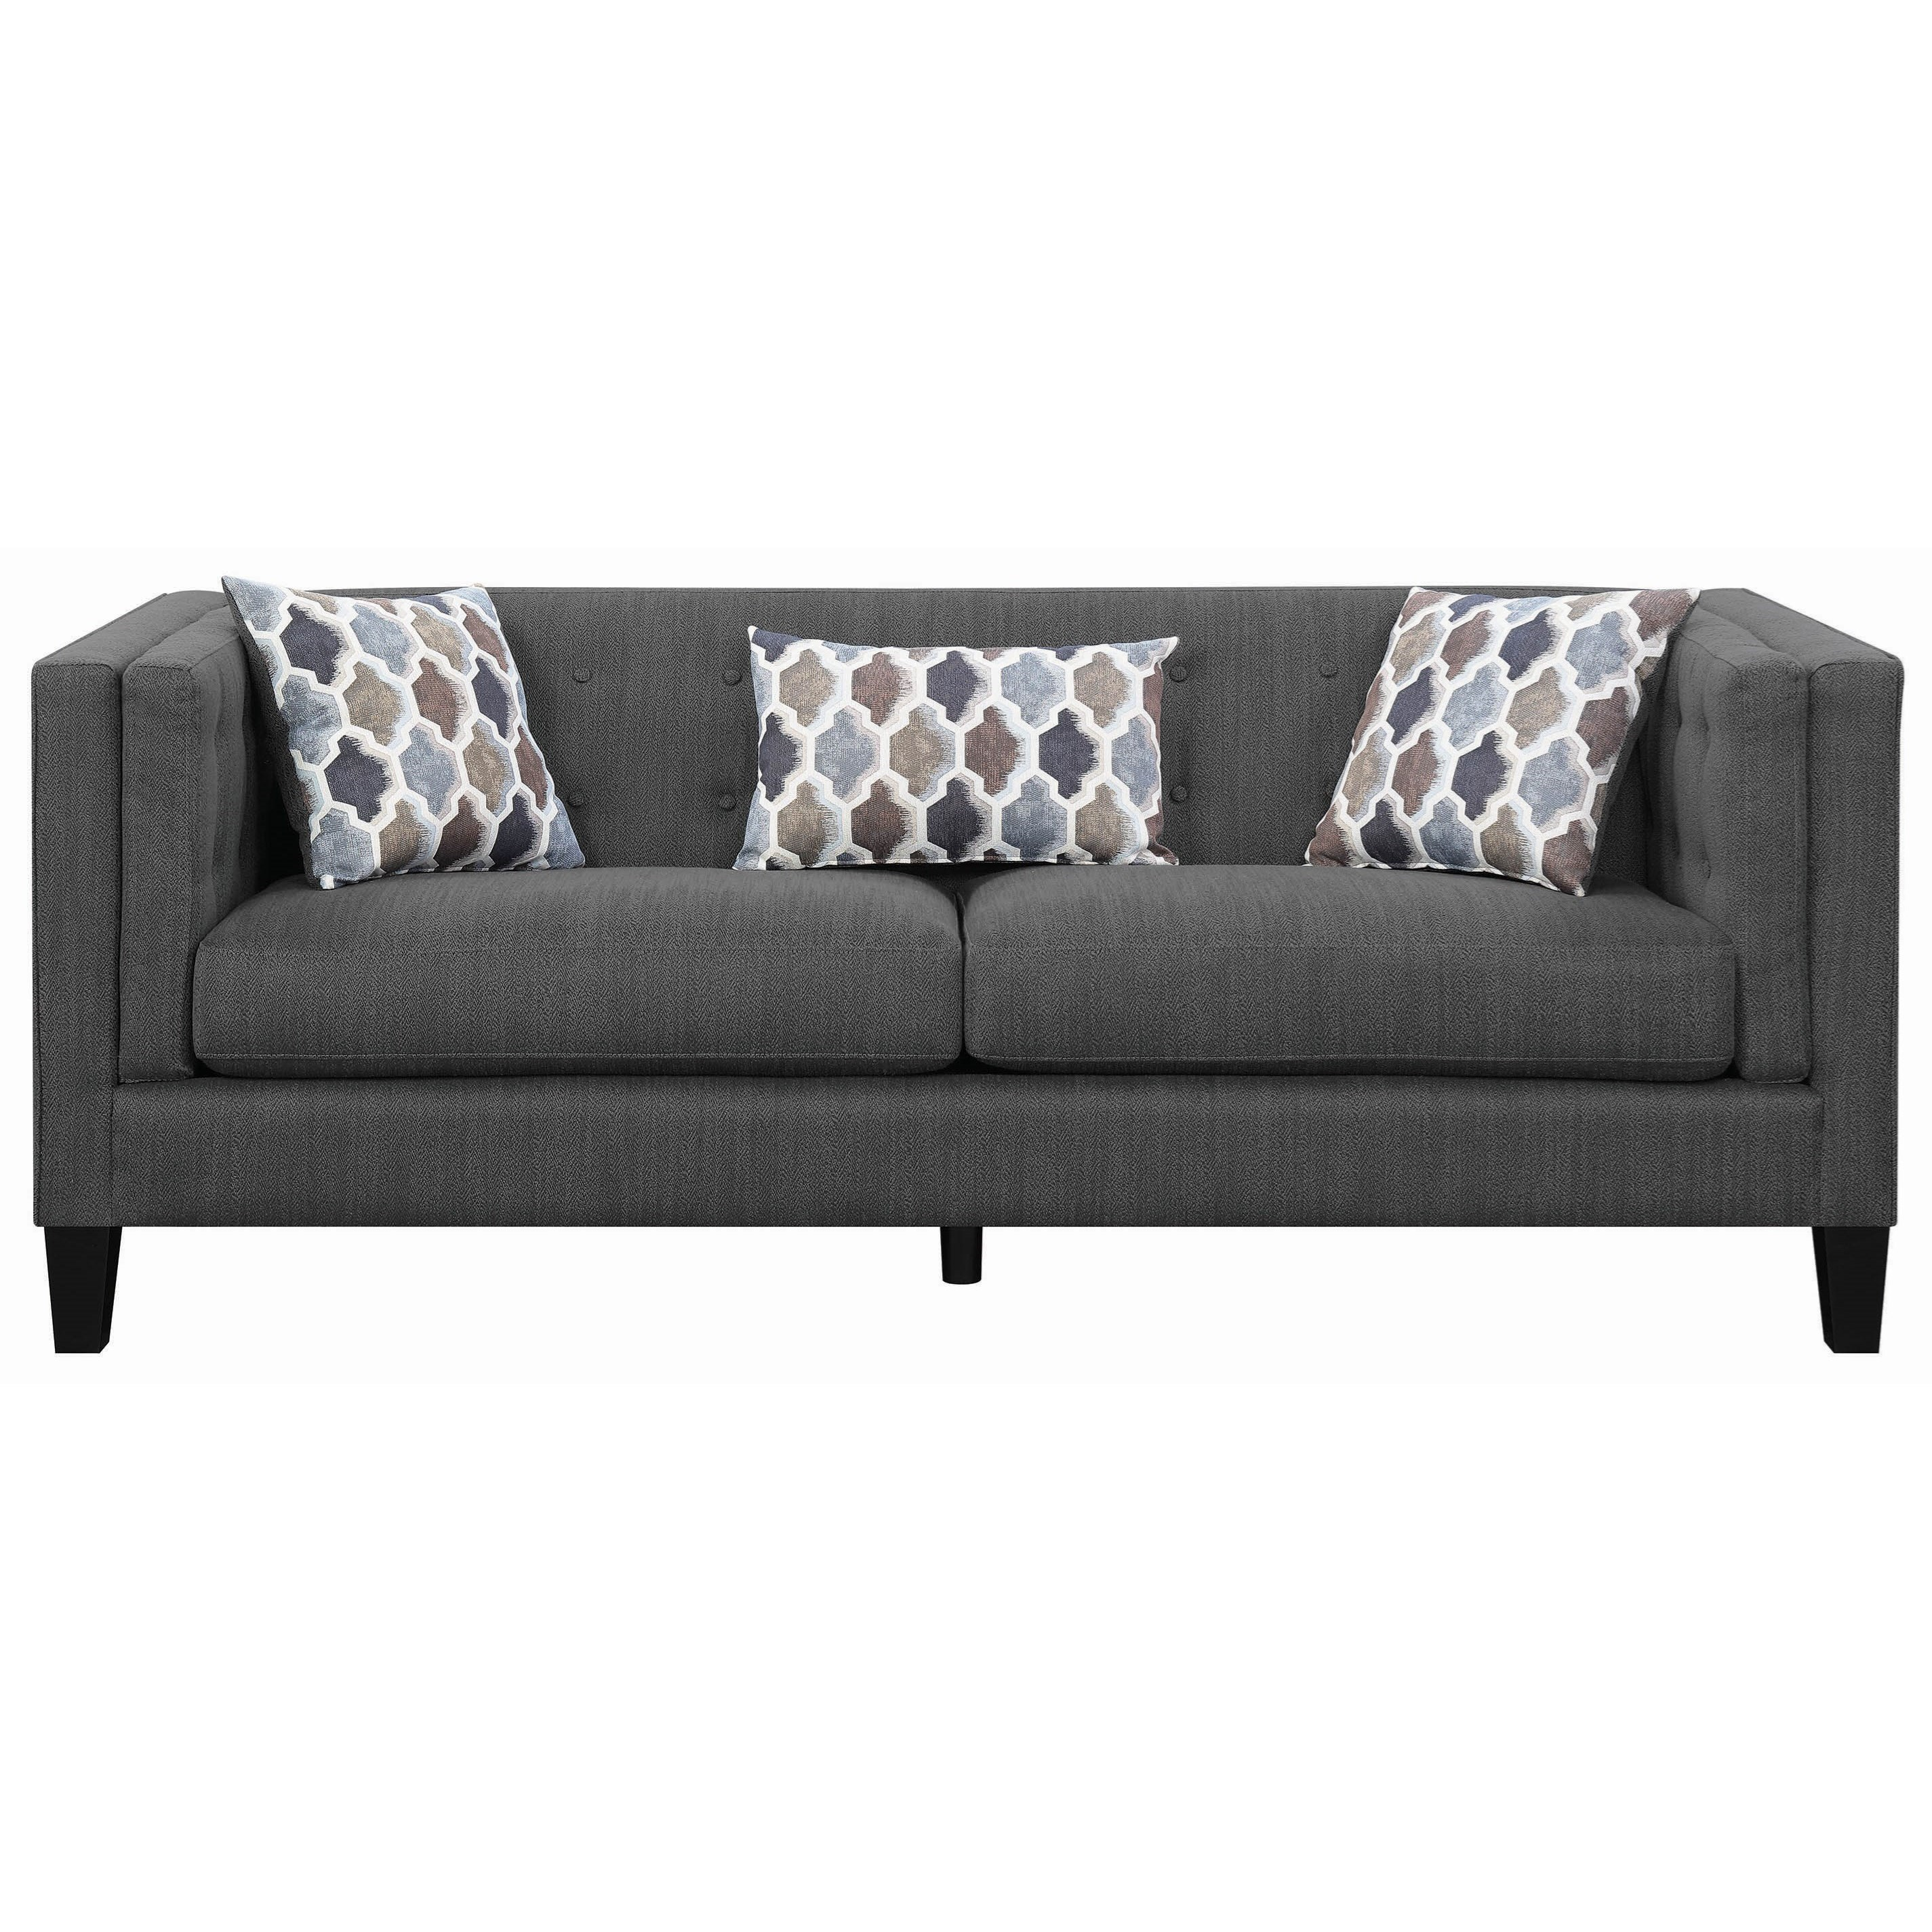 Modern Sofa Vancouver: Scott Living Sawyer Modern Sofa With Track Arms